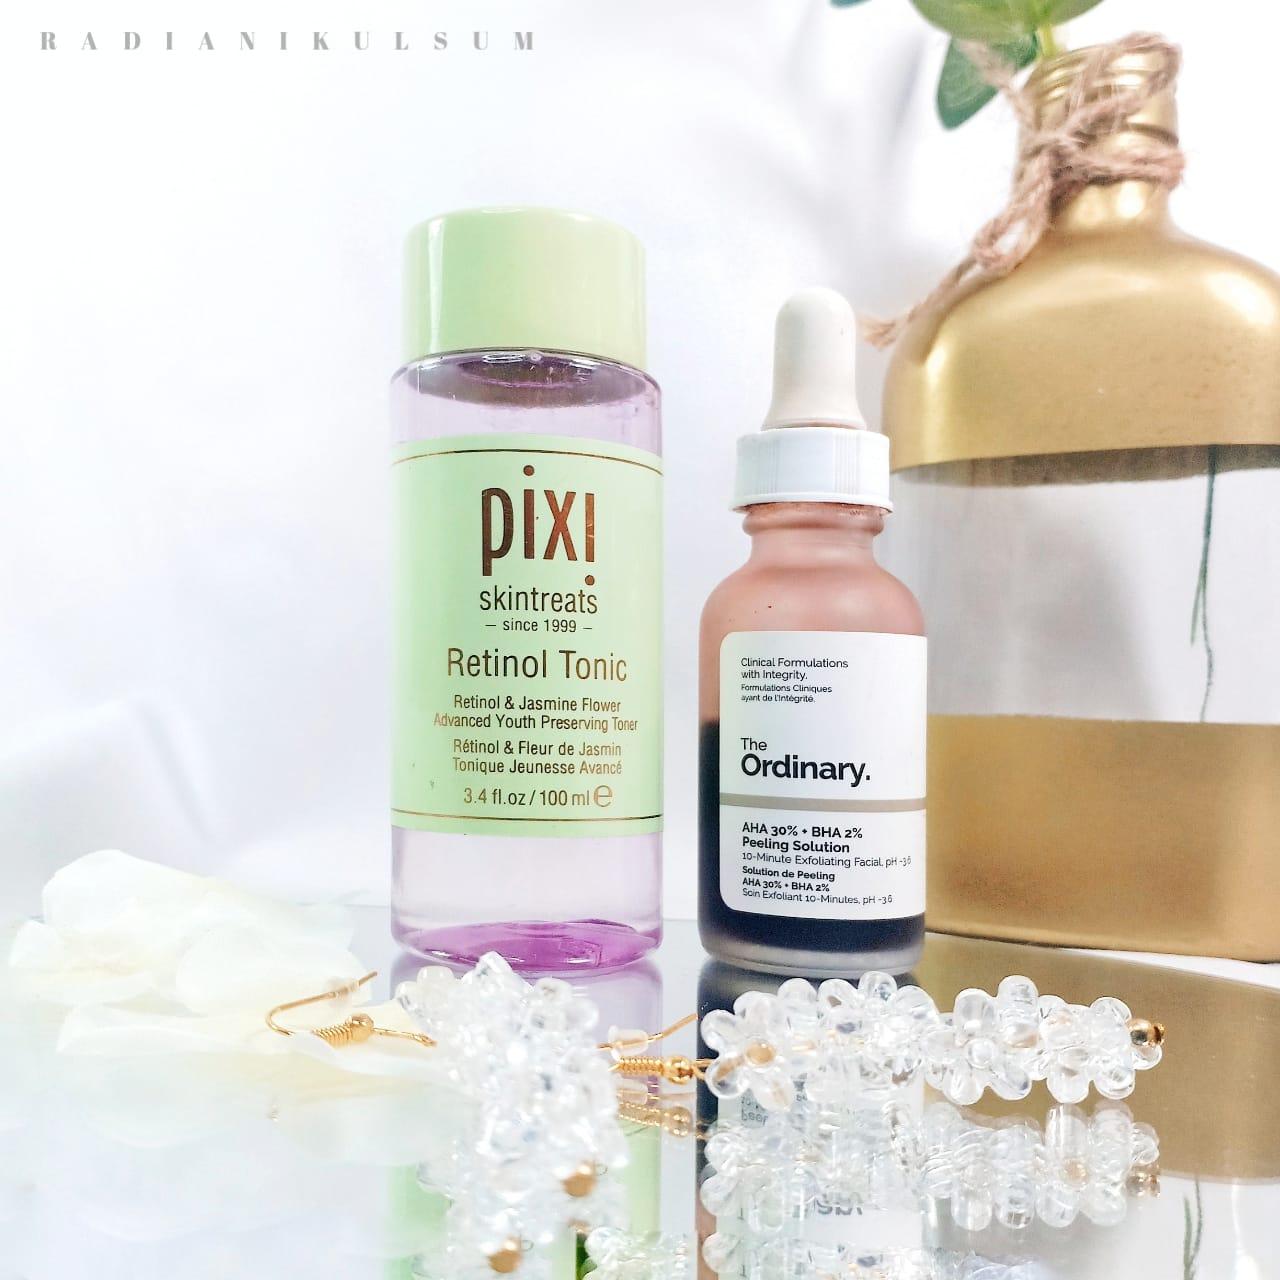 Pixi Retinol Tonic & The Ordinary AHA 30% + BHA 2% Peeling Solution